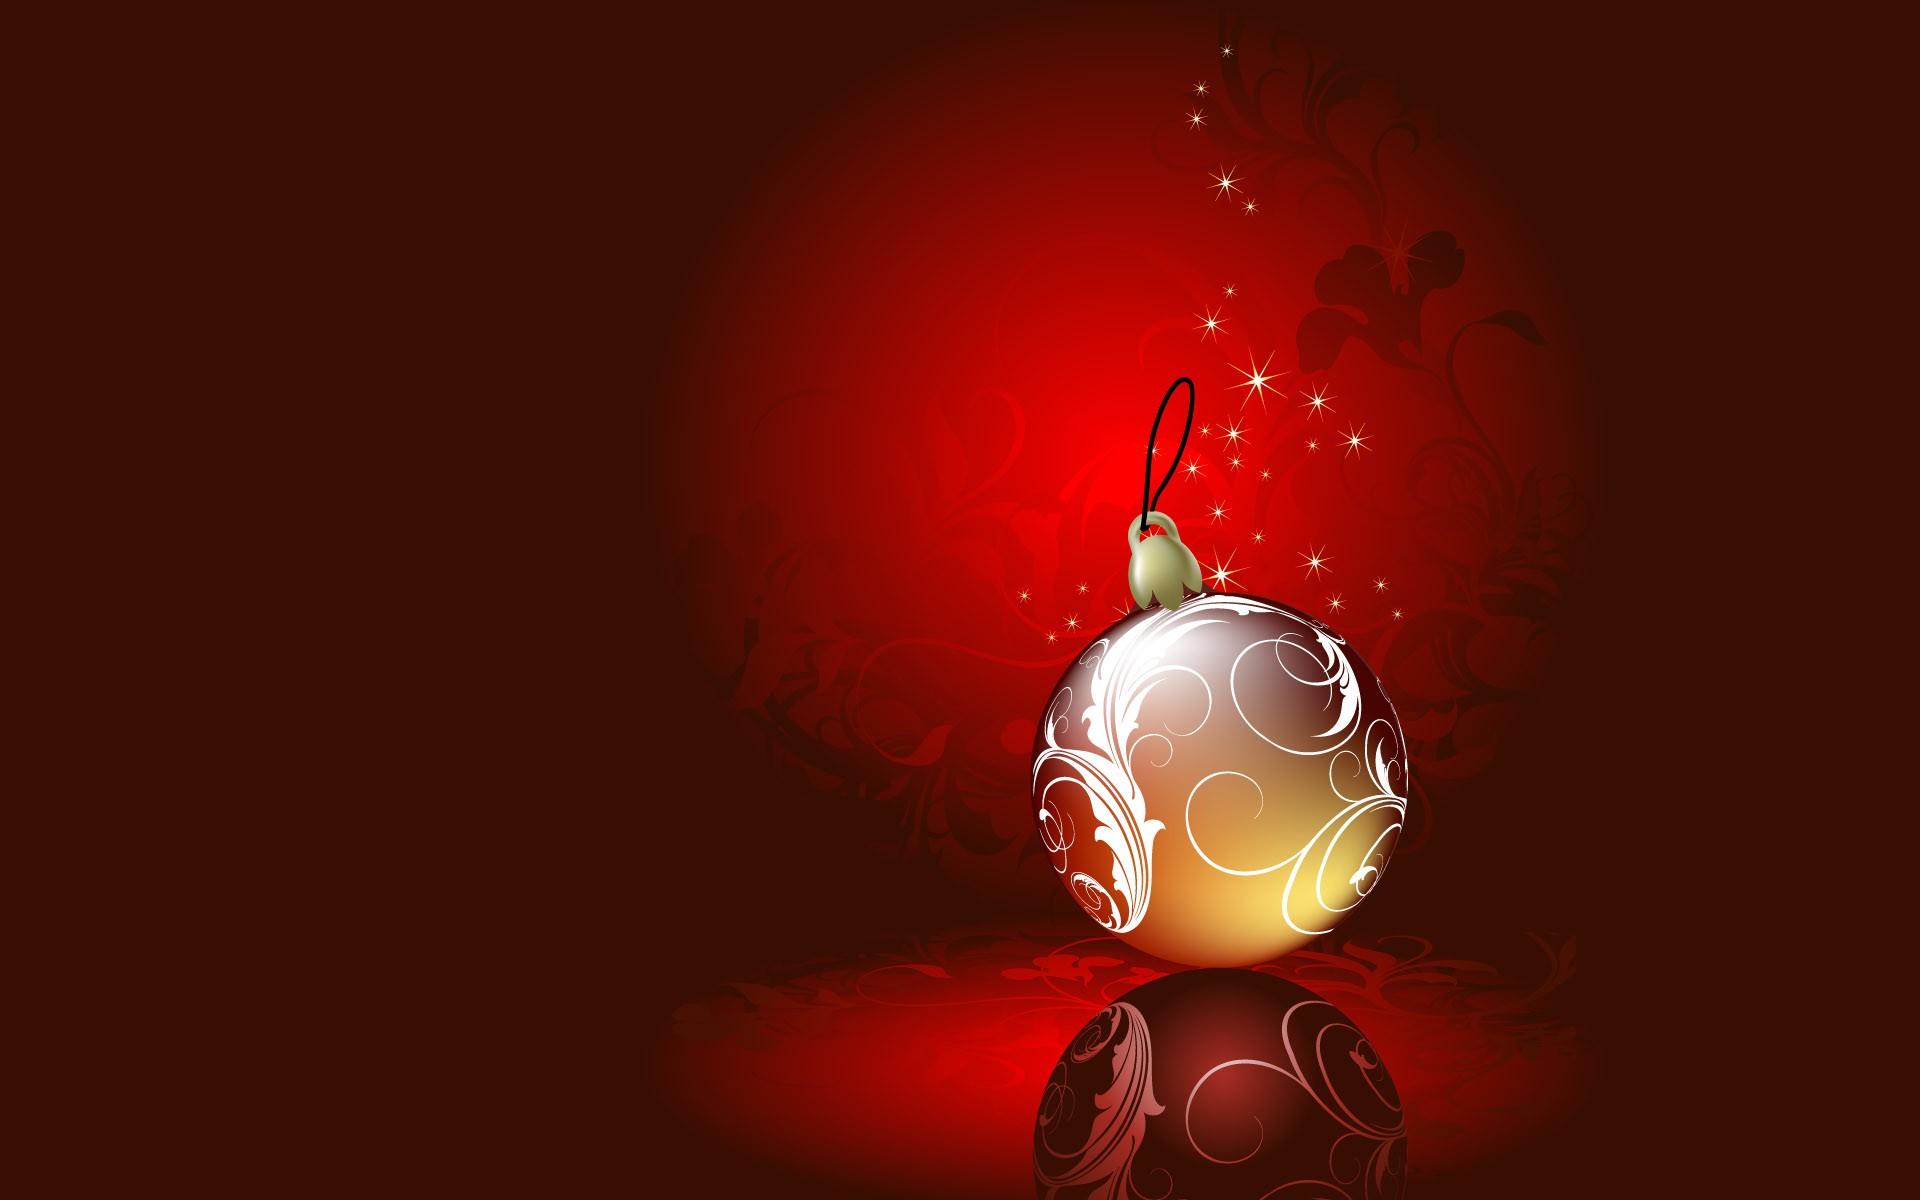 Fondos de pantalla hd de navidad taringa for Foto full hd per desktop